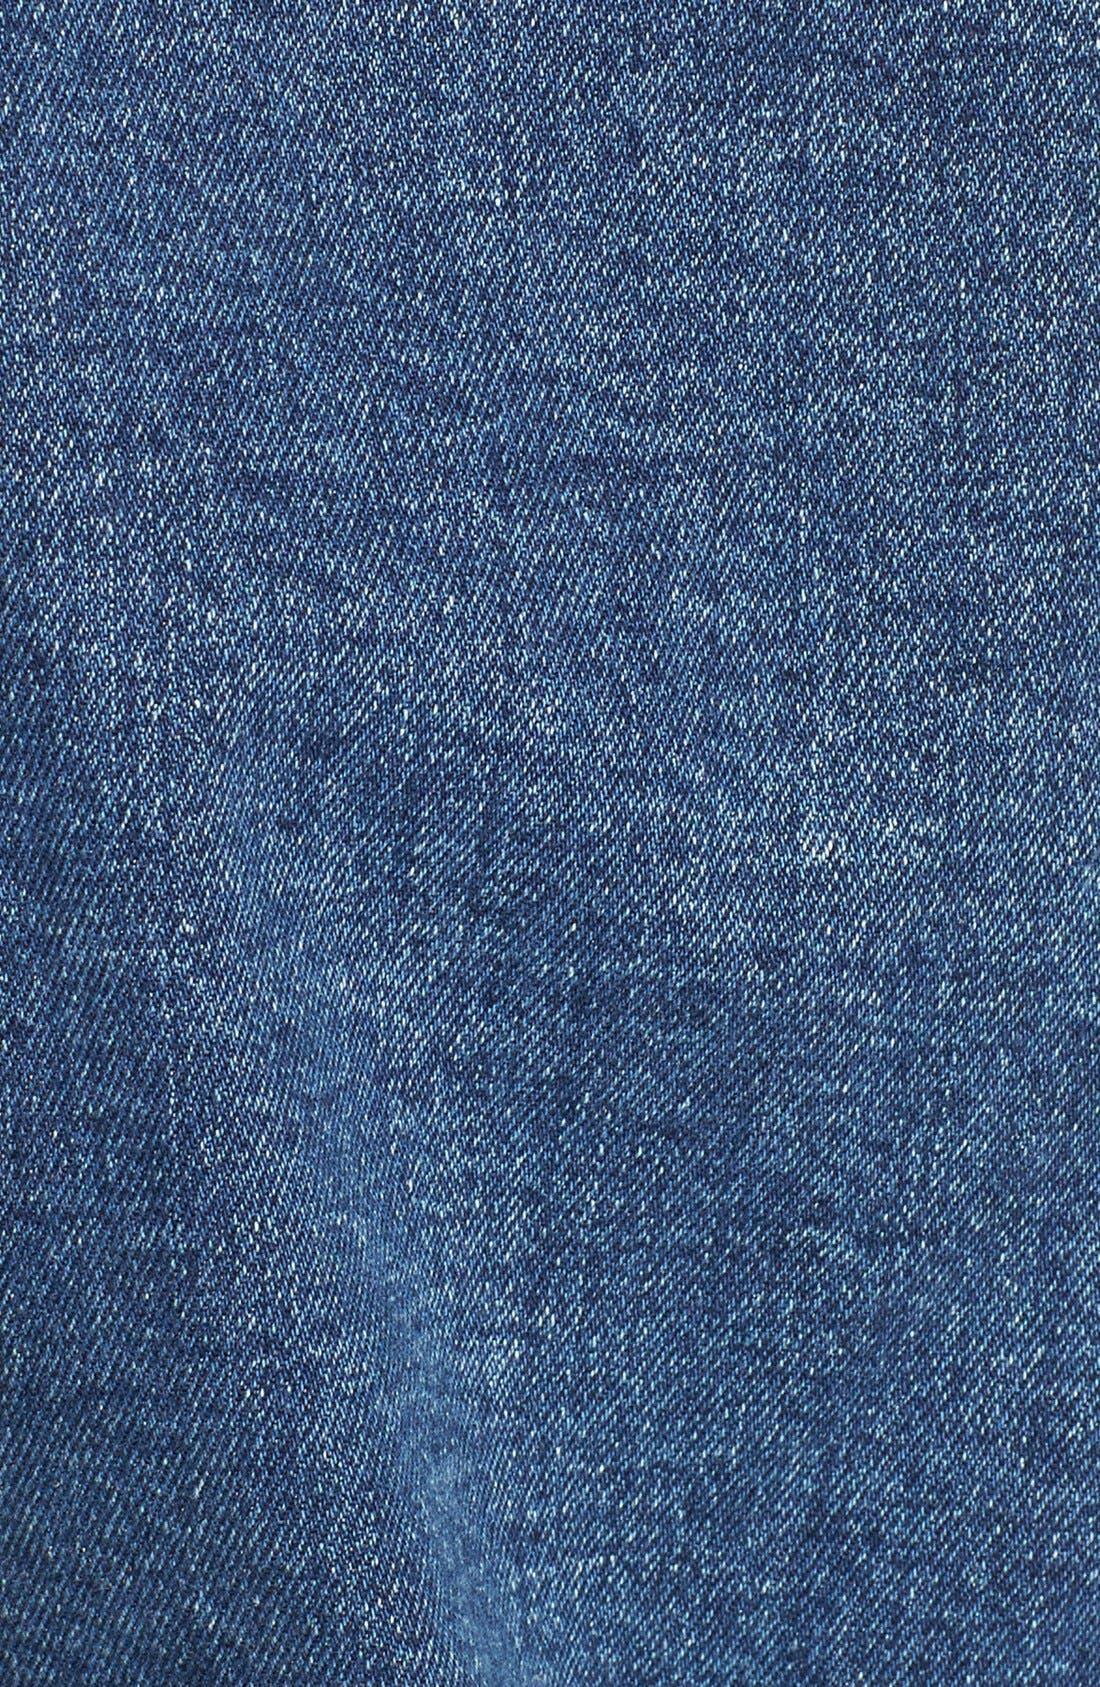 PAIGE,                             'Leo' Faux Shearling Denim Jacket,                             Alternate thumbnail 3, color,                             400